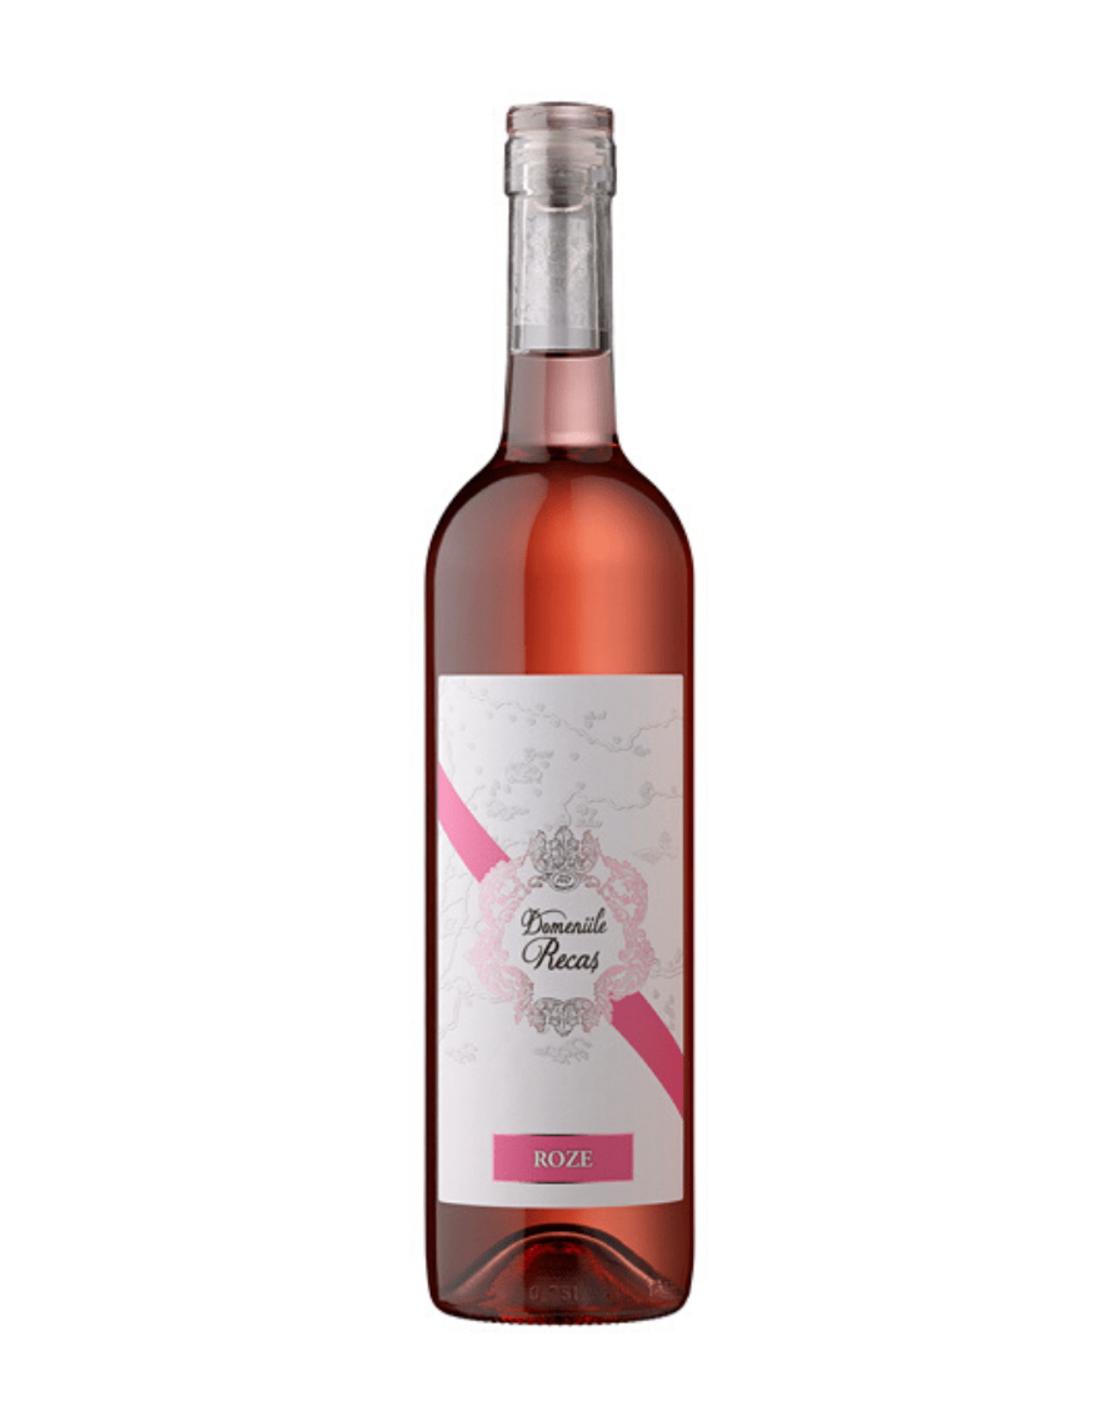 Vin roze demisec, Cupaj, Domeniile Recas, 12.5% alc., 0.75L, Romania